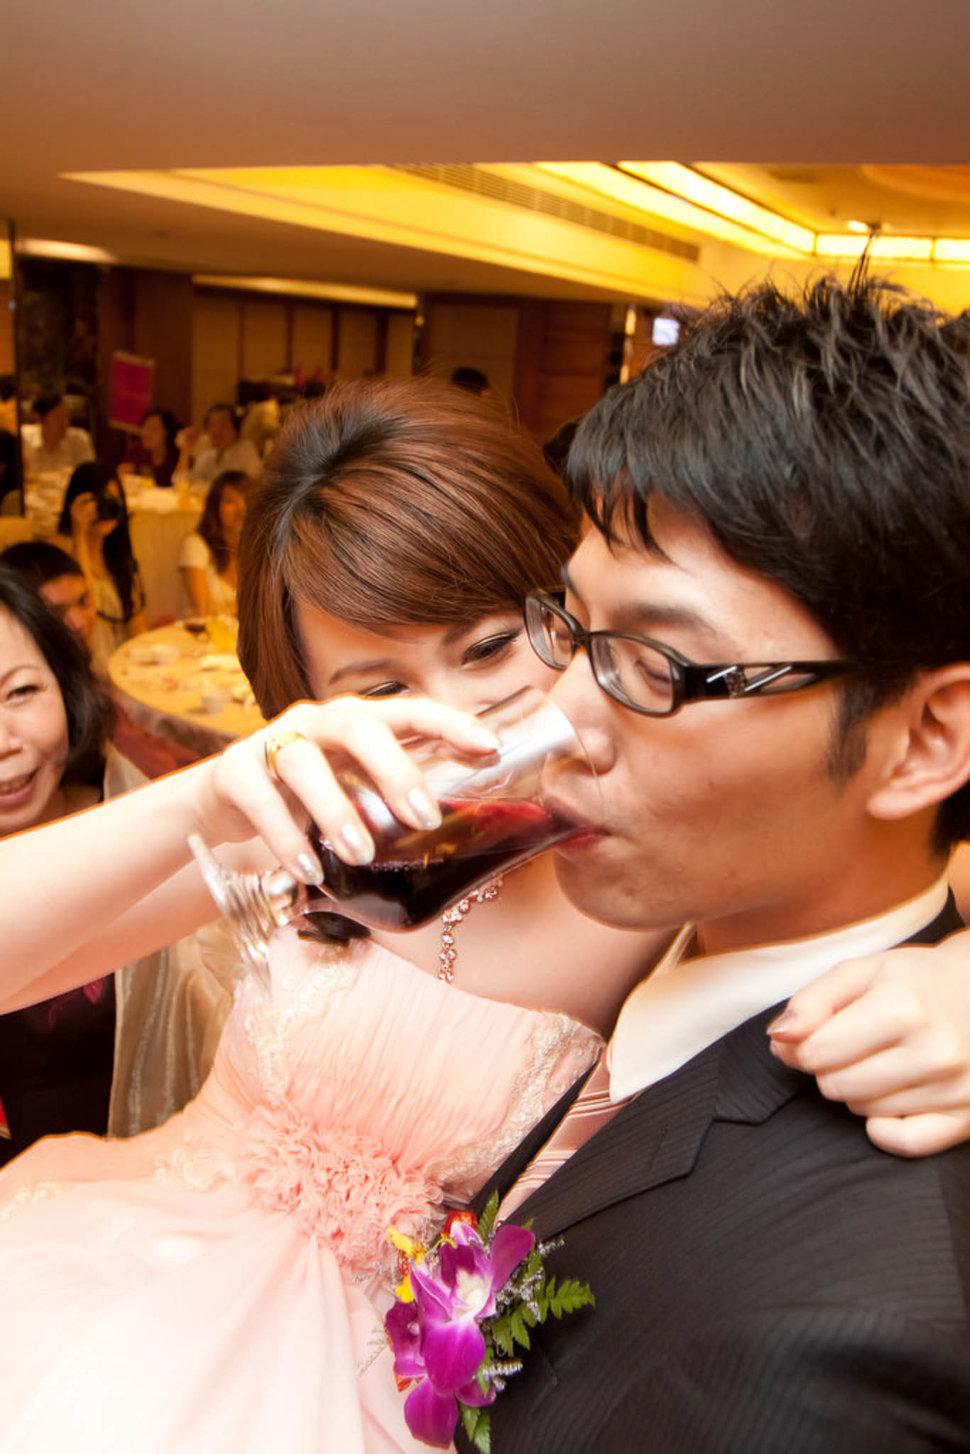 18PHOTO-佳成❤️ 玨萍(編號:220193) - 18PHOTO 婚紗影像攝影工作室 - 結婚吧